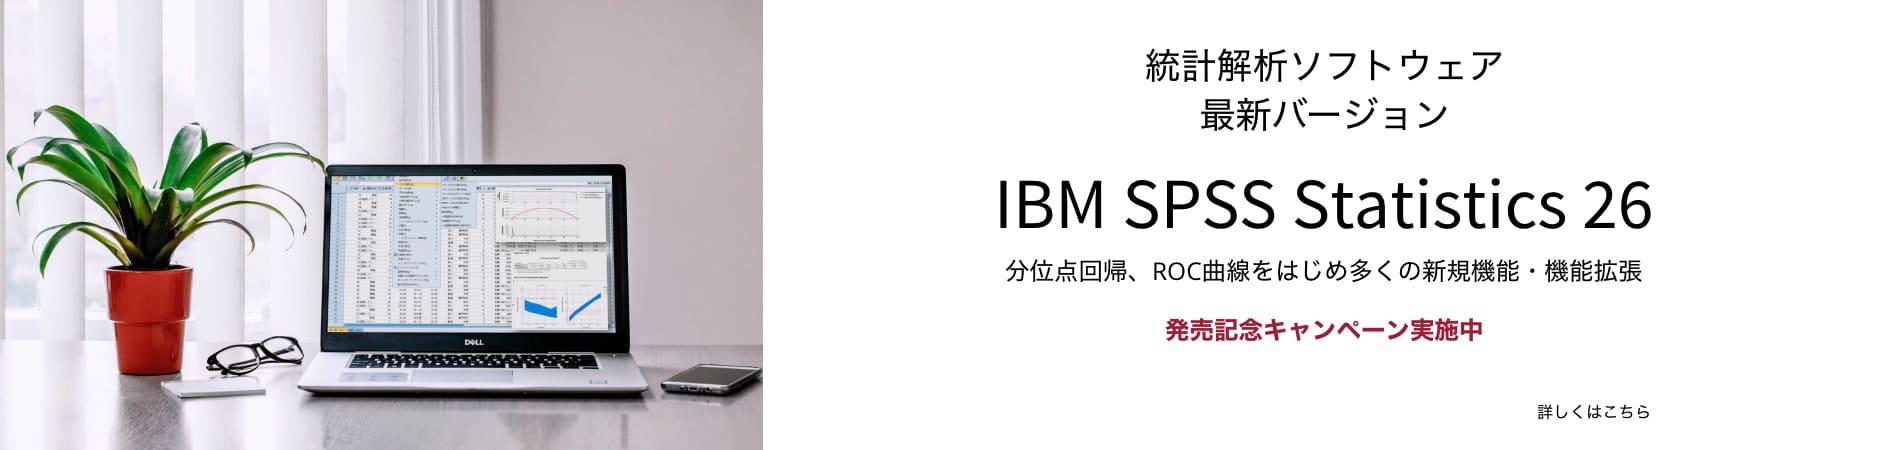 IBM SPSS Statistics 26 発売記念キャンペーン